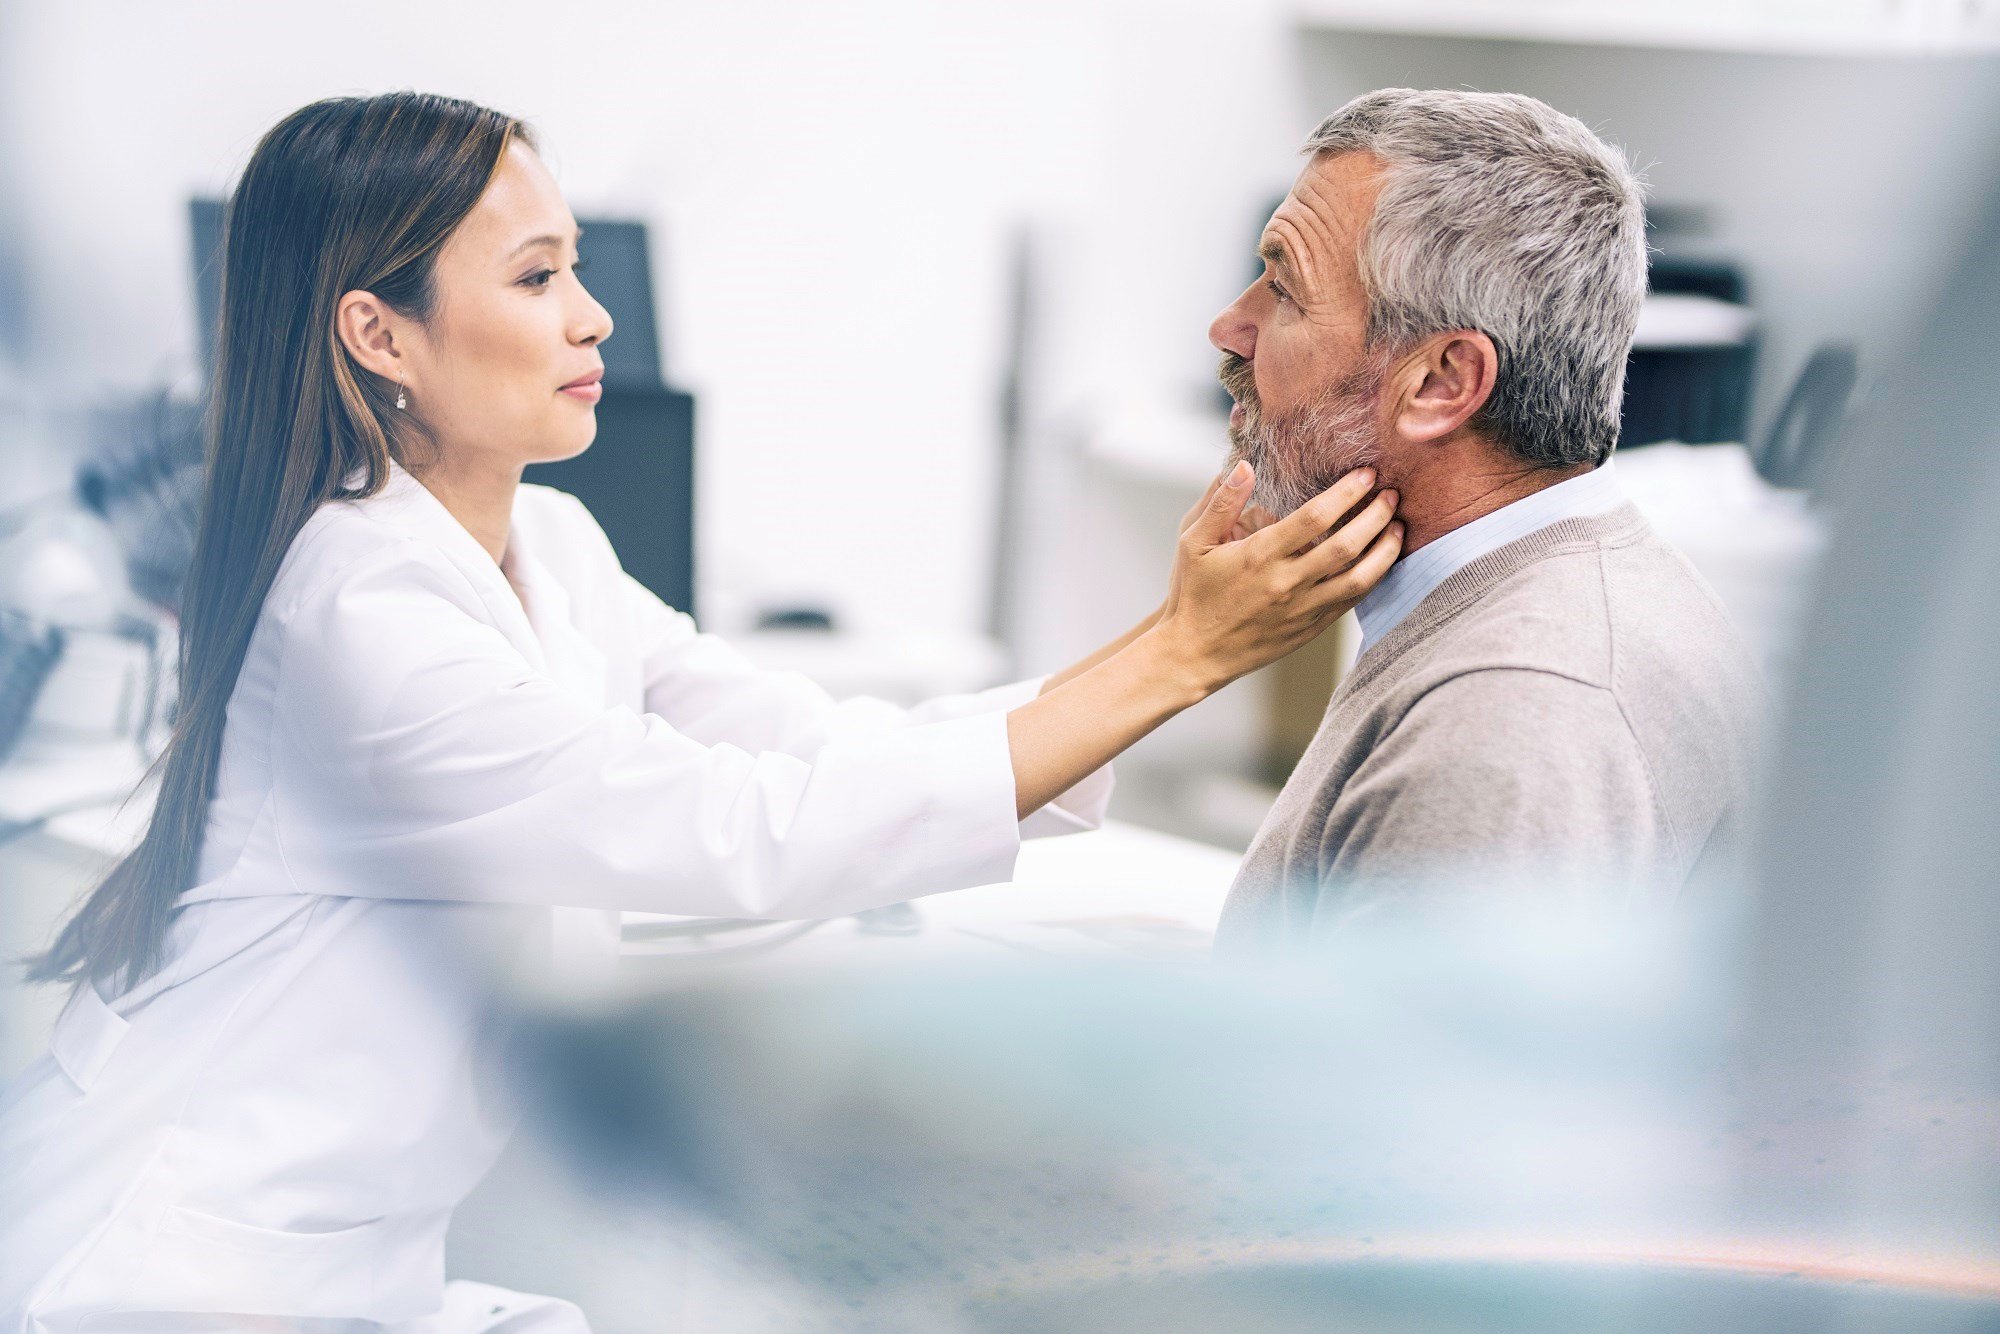 Male Thyroid Cancer Survivors Face Higher CVD Risk